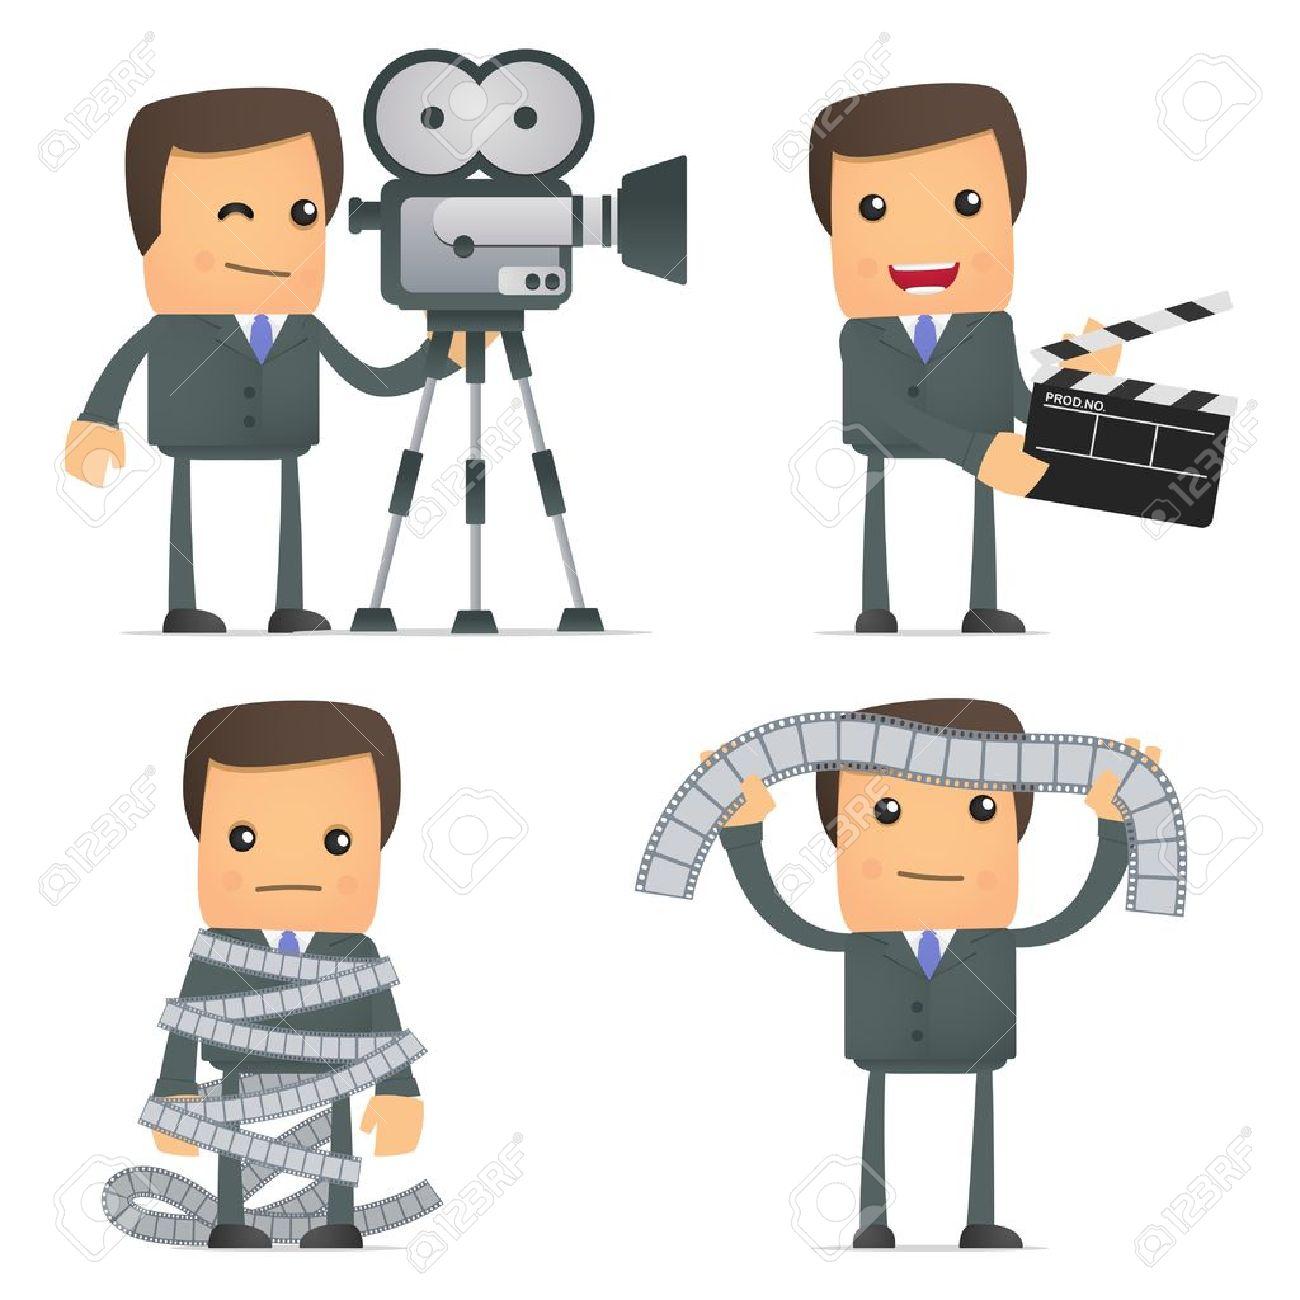 http://www.dvolver.com/moviemaker/make.html